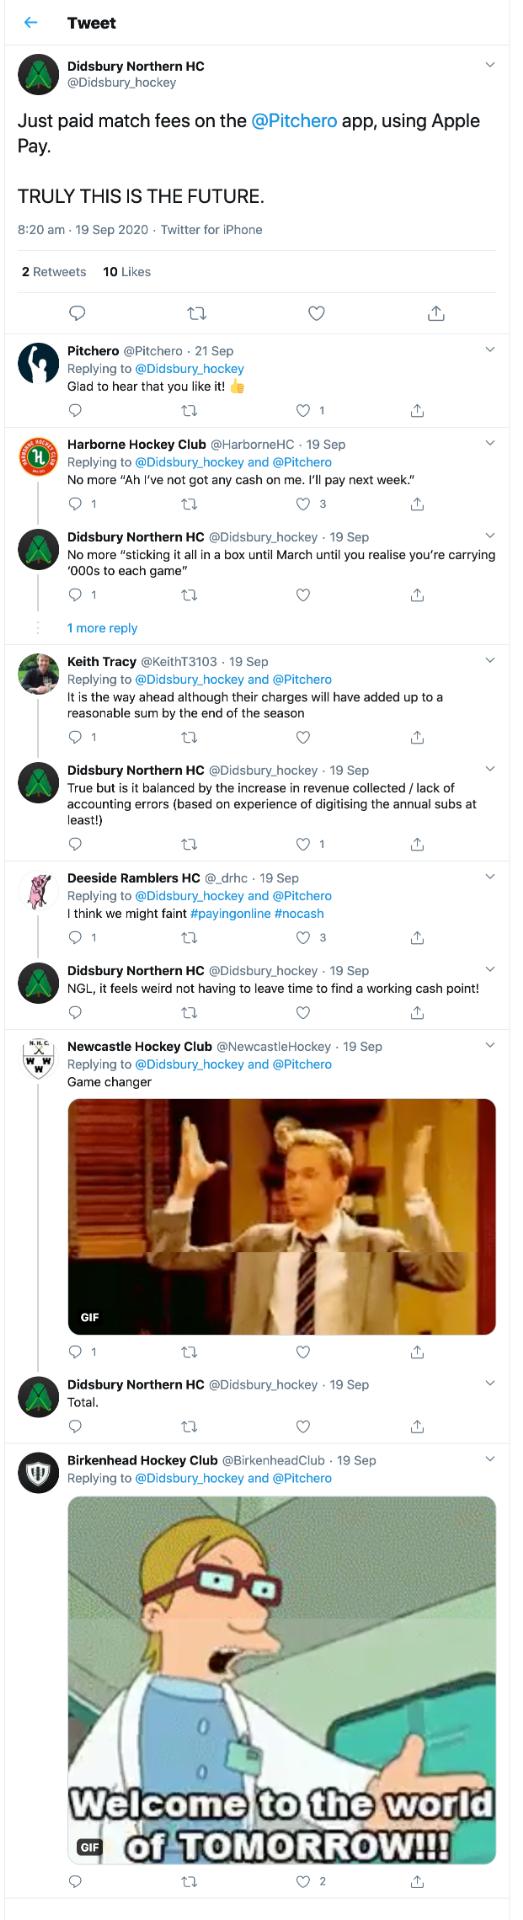 pitchero-twitter-Didsbury-hockey-match-fees-blog